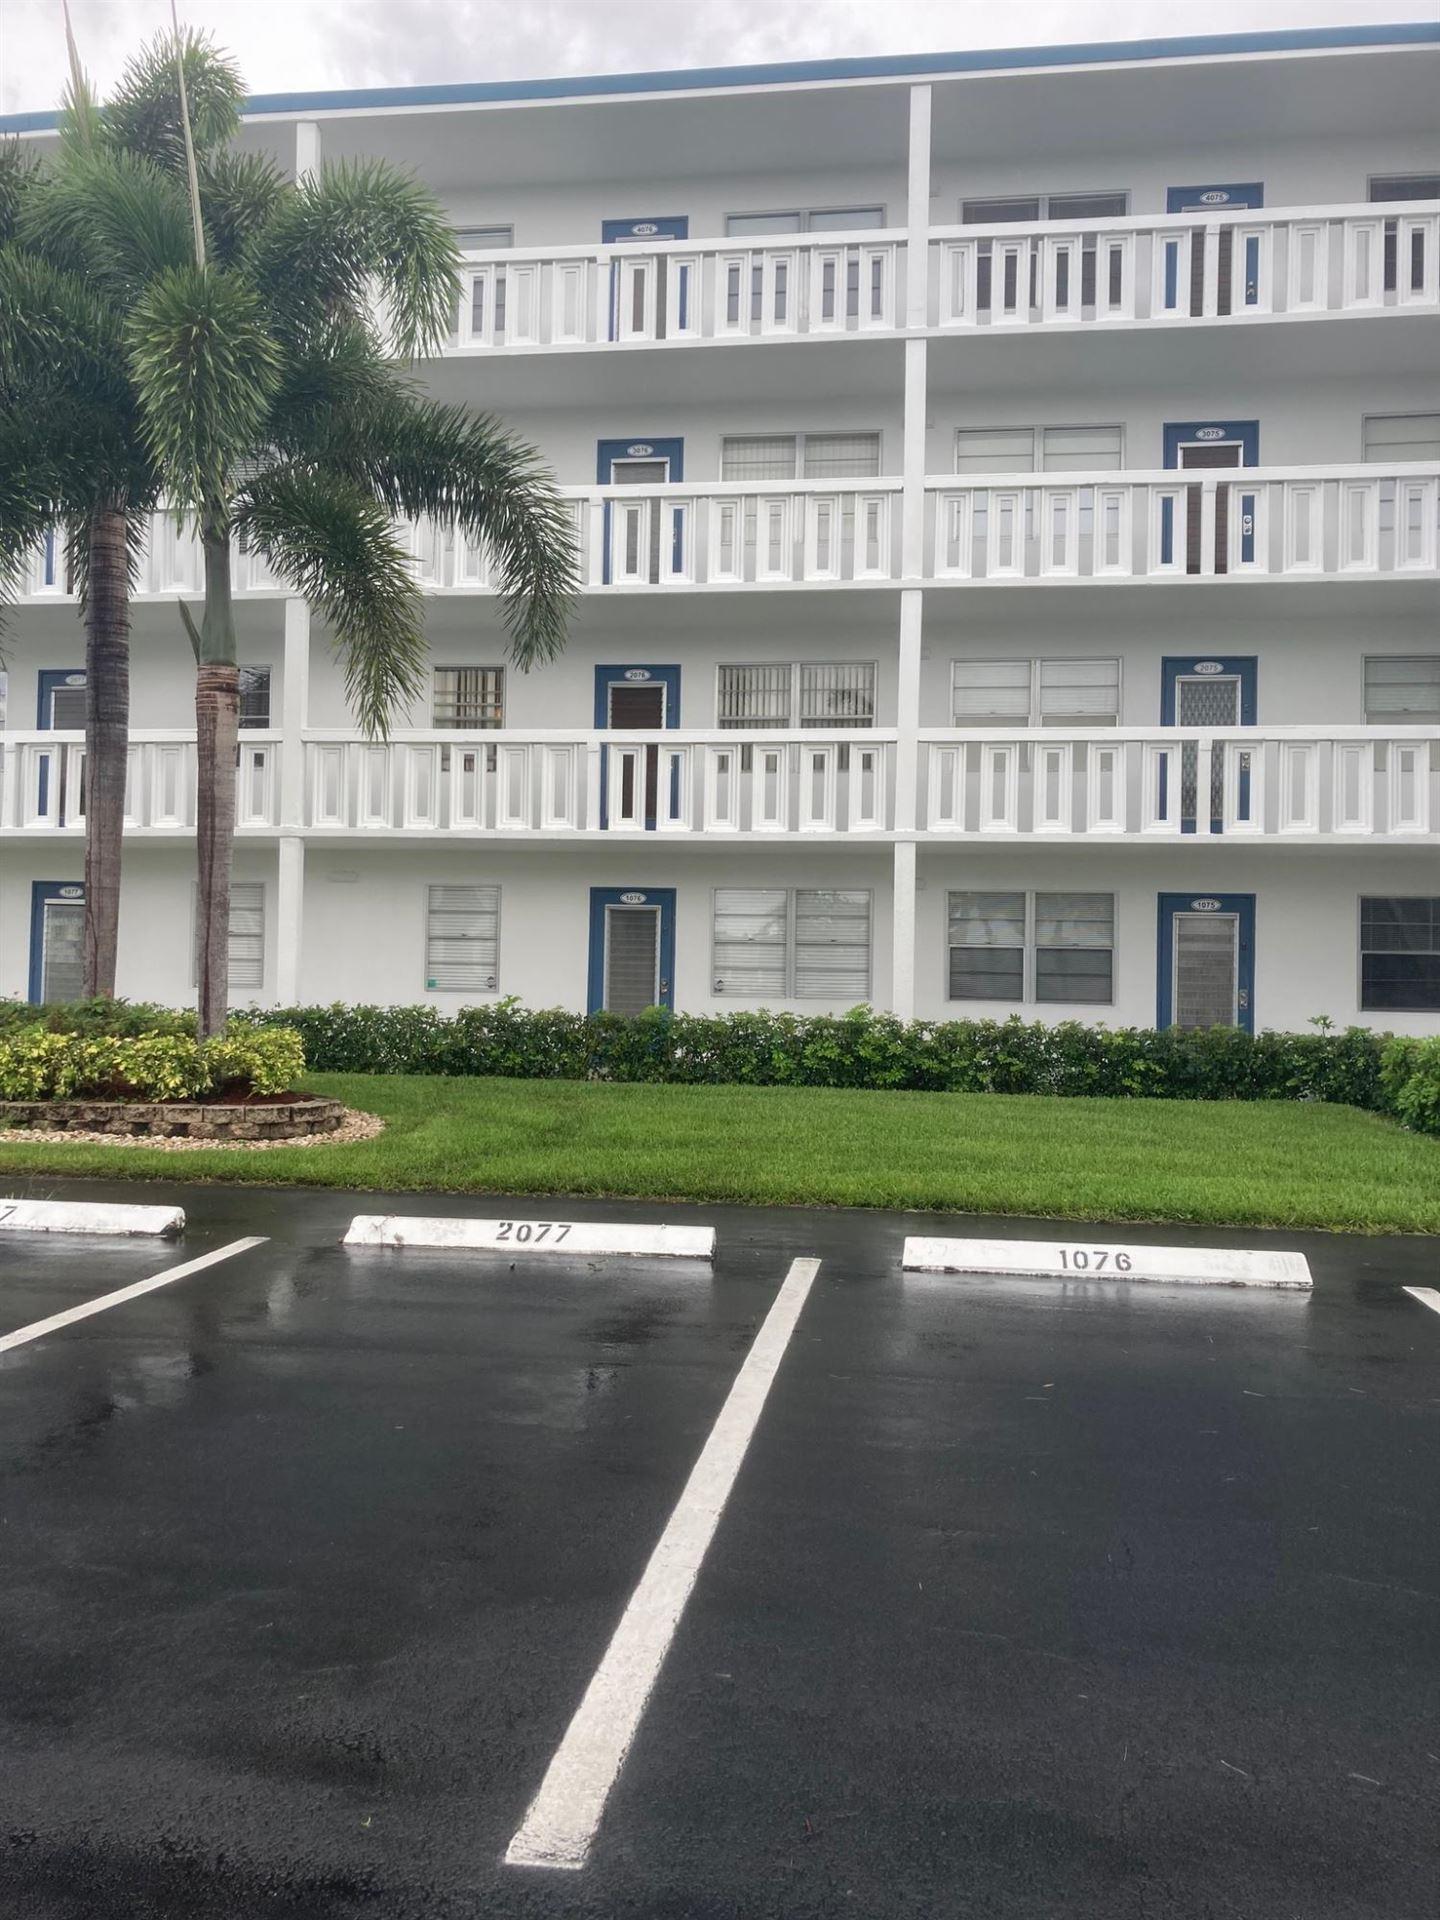 2076 Exeter E, Boca Raton, FL 33434 - MLS#: RX-10728120